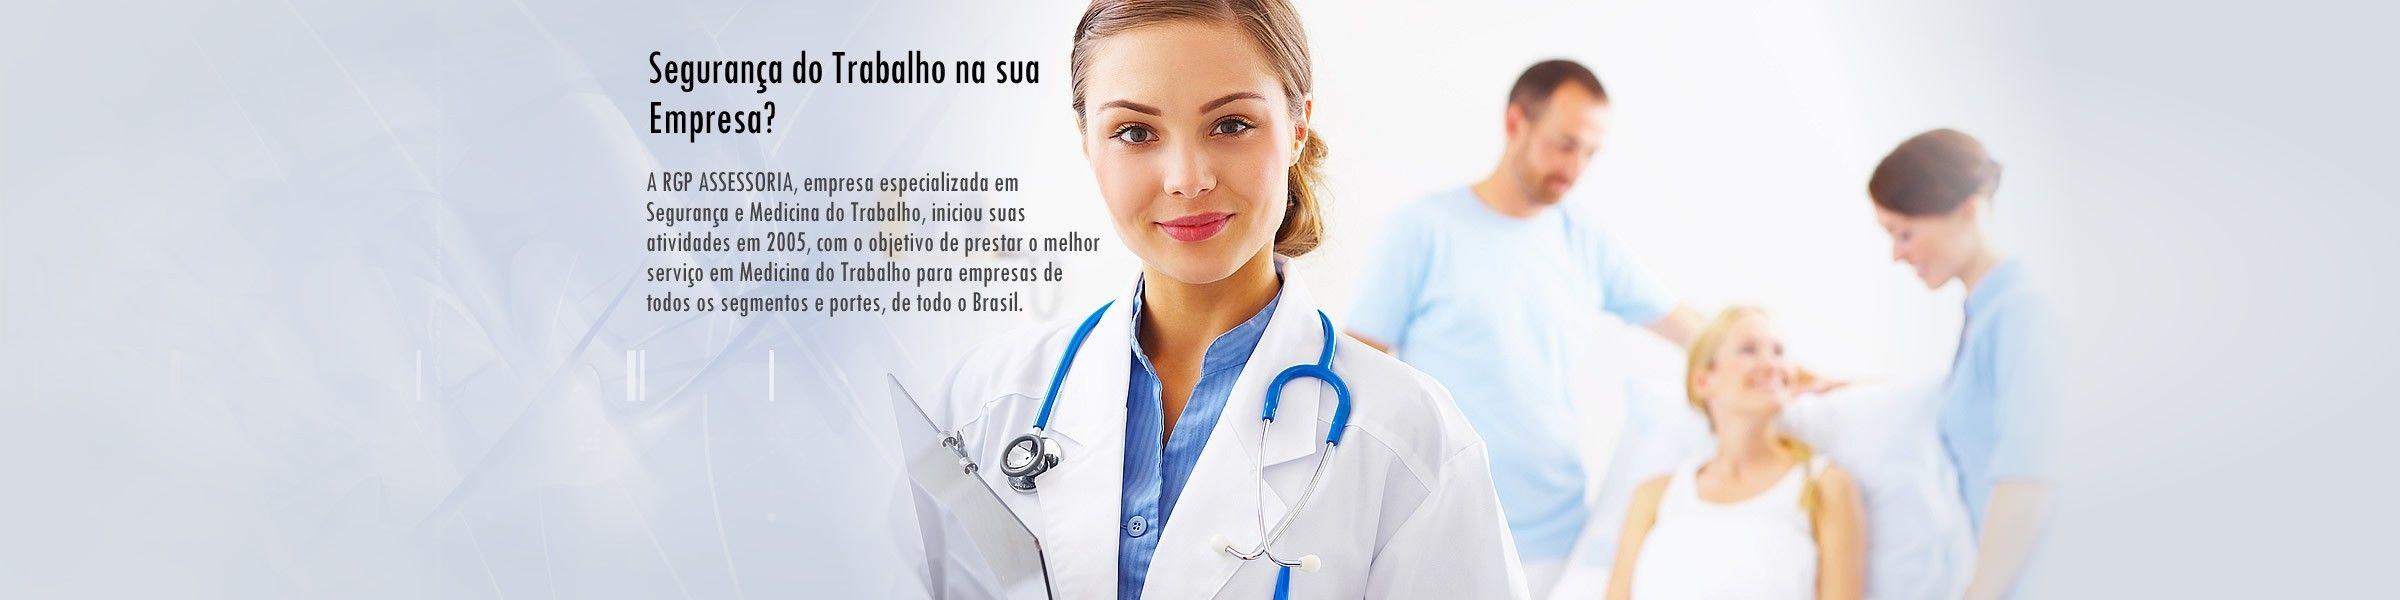 Atestados Ocupacionais de Saúde Onde Conseguir no Jardim Guarapiranga - Atestado de Saúde Ocupacional ASO